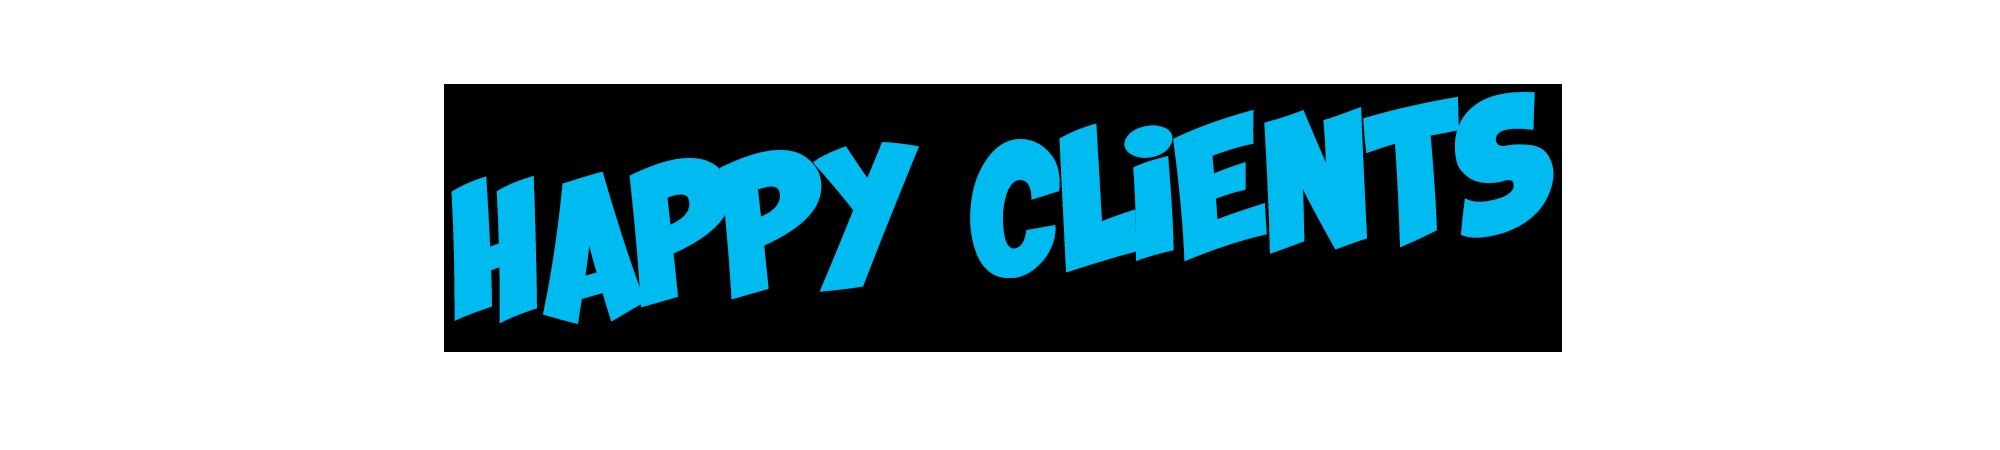 Happy Client Testimonials from PureKat Consultancy